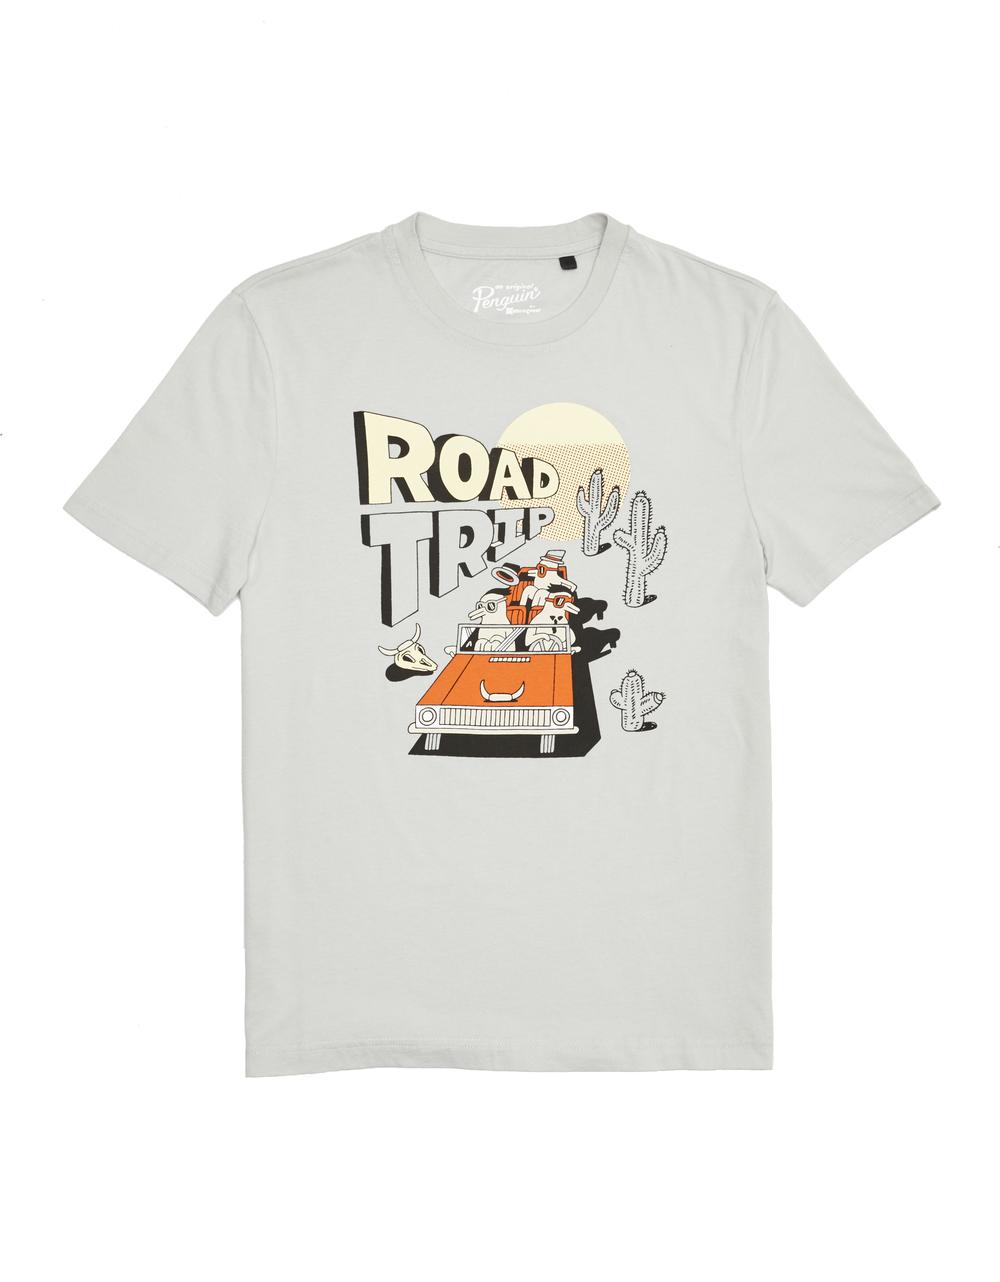 Jeremyville Tshirt 3.jpg